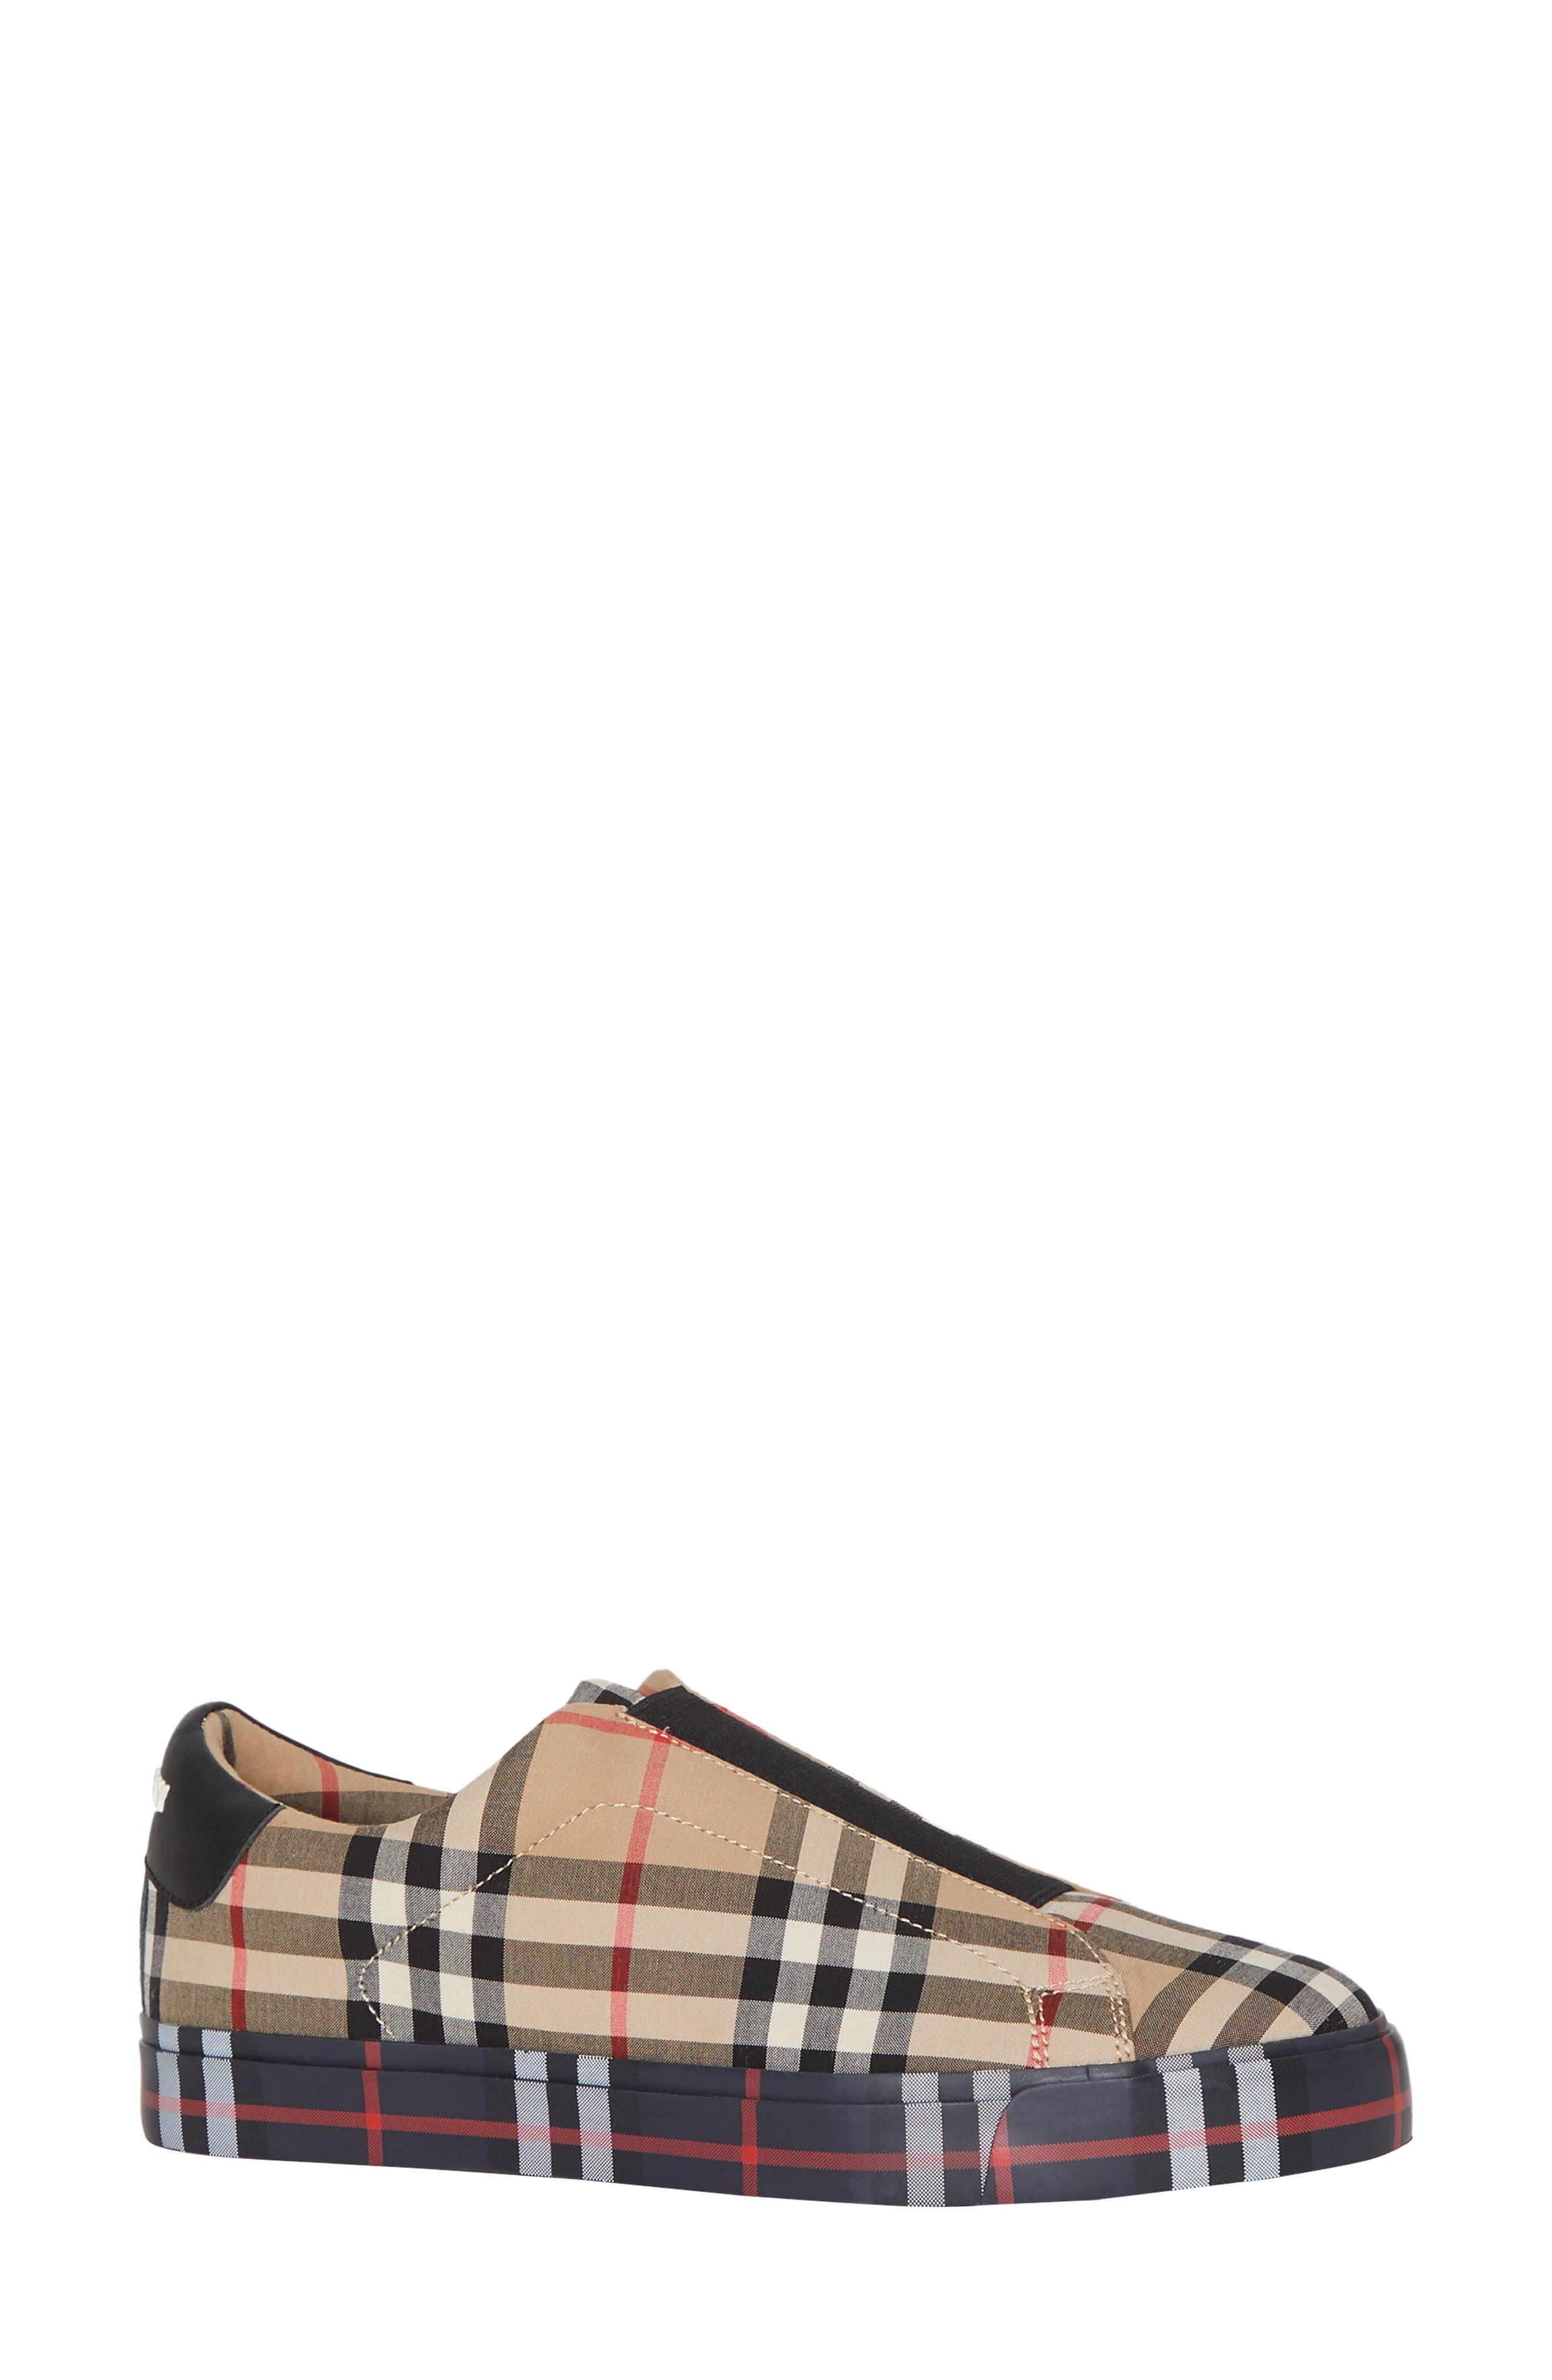 Markham Vintage Check Slip-On Sneaker, Main, color, BEIGE PLAID